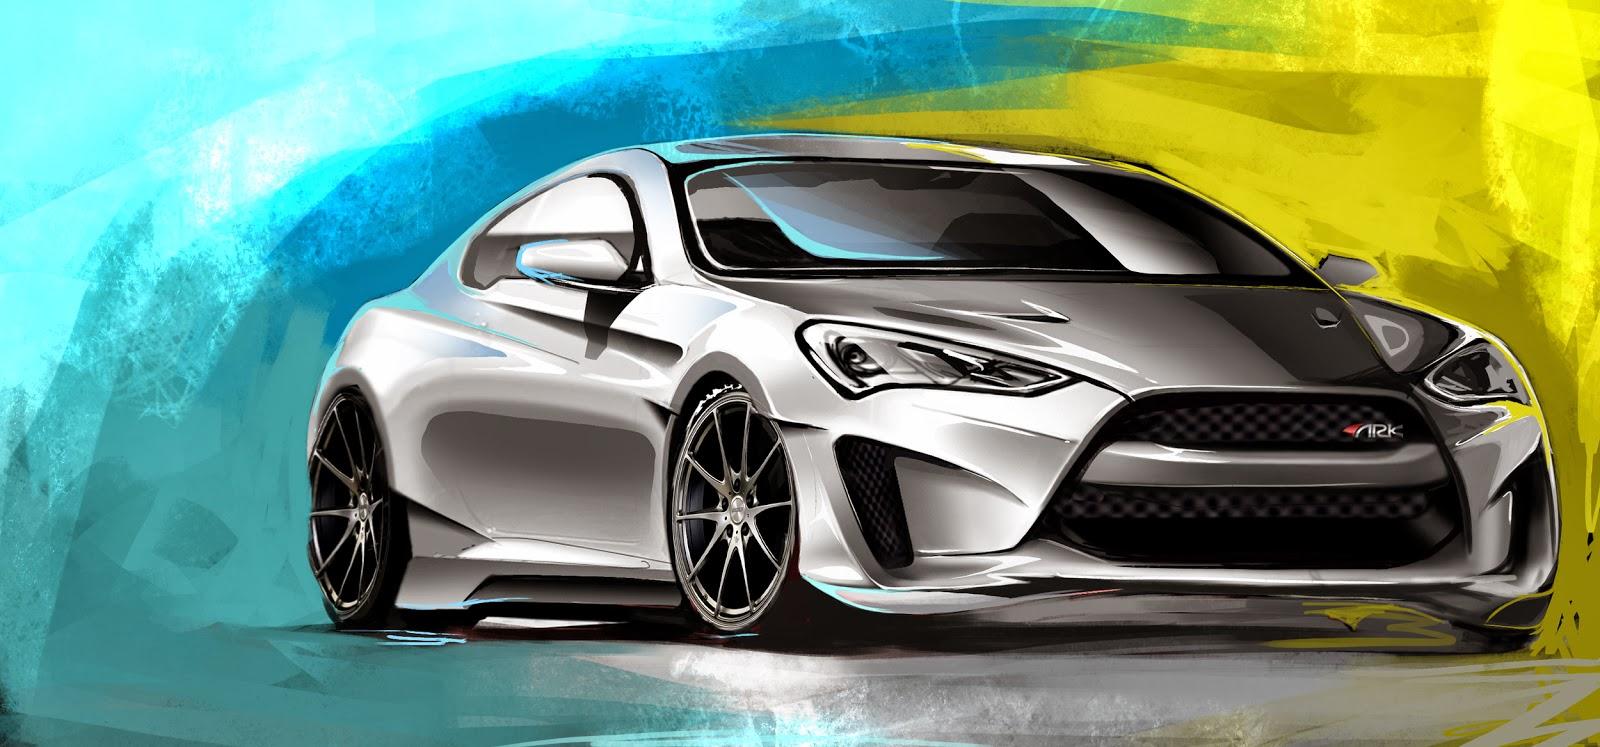 automotiveblogz hyundai genesis coupe ark performance. Black Bedroom Furniture Sets. Home Design Ideas